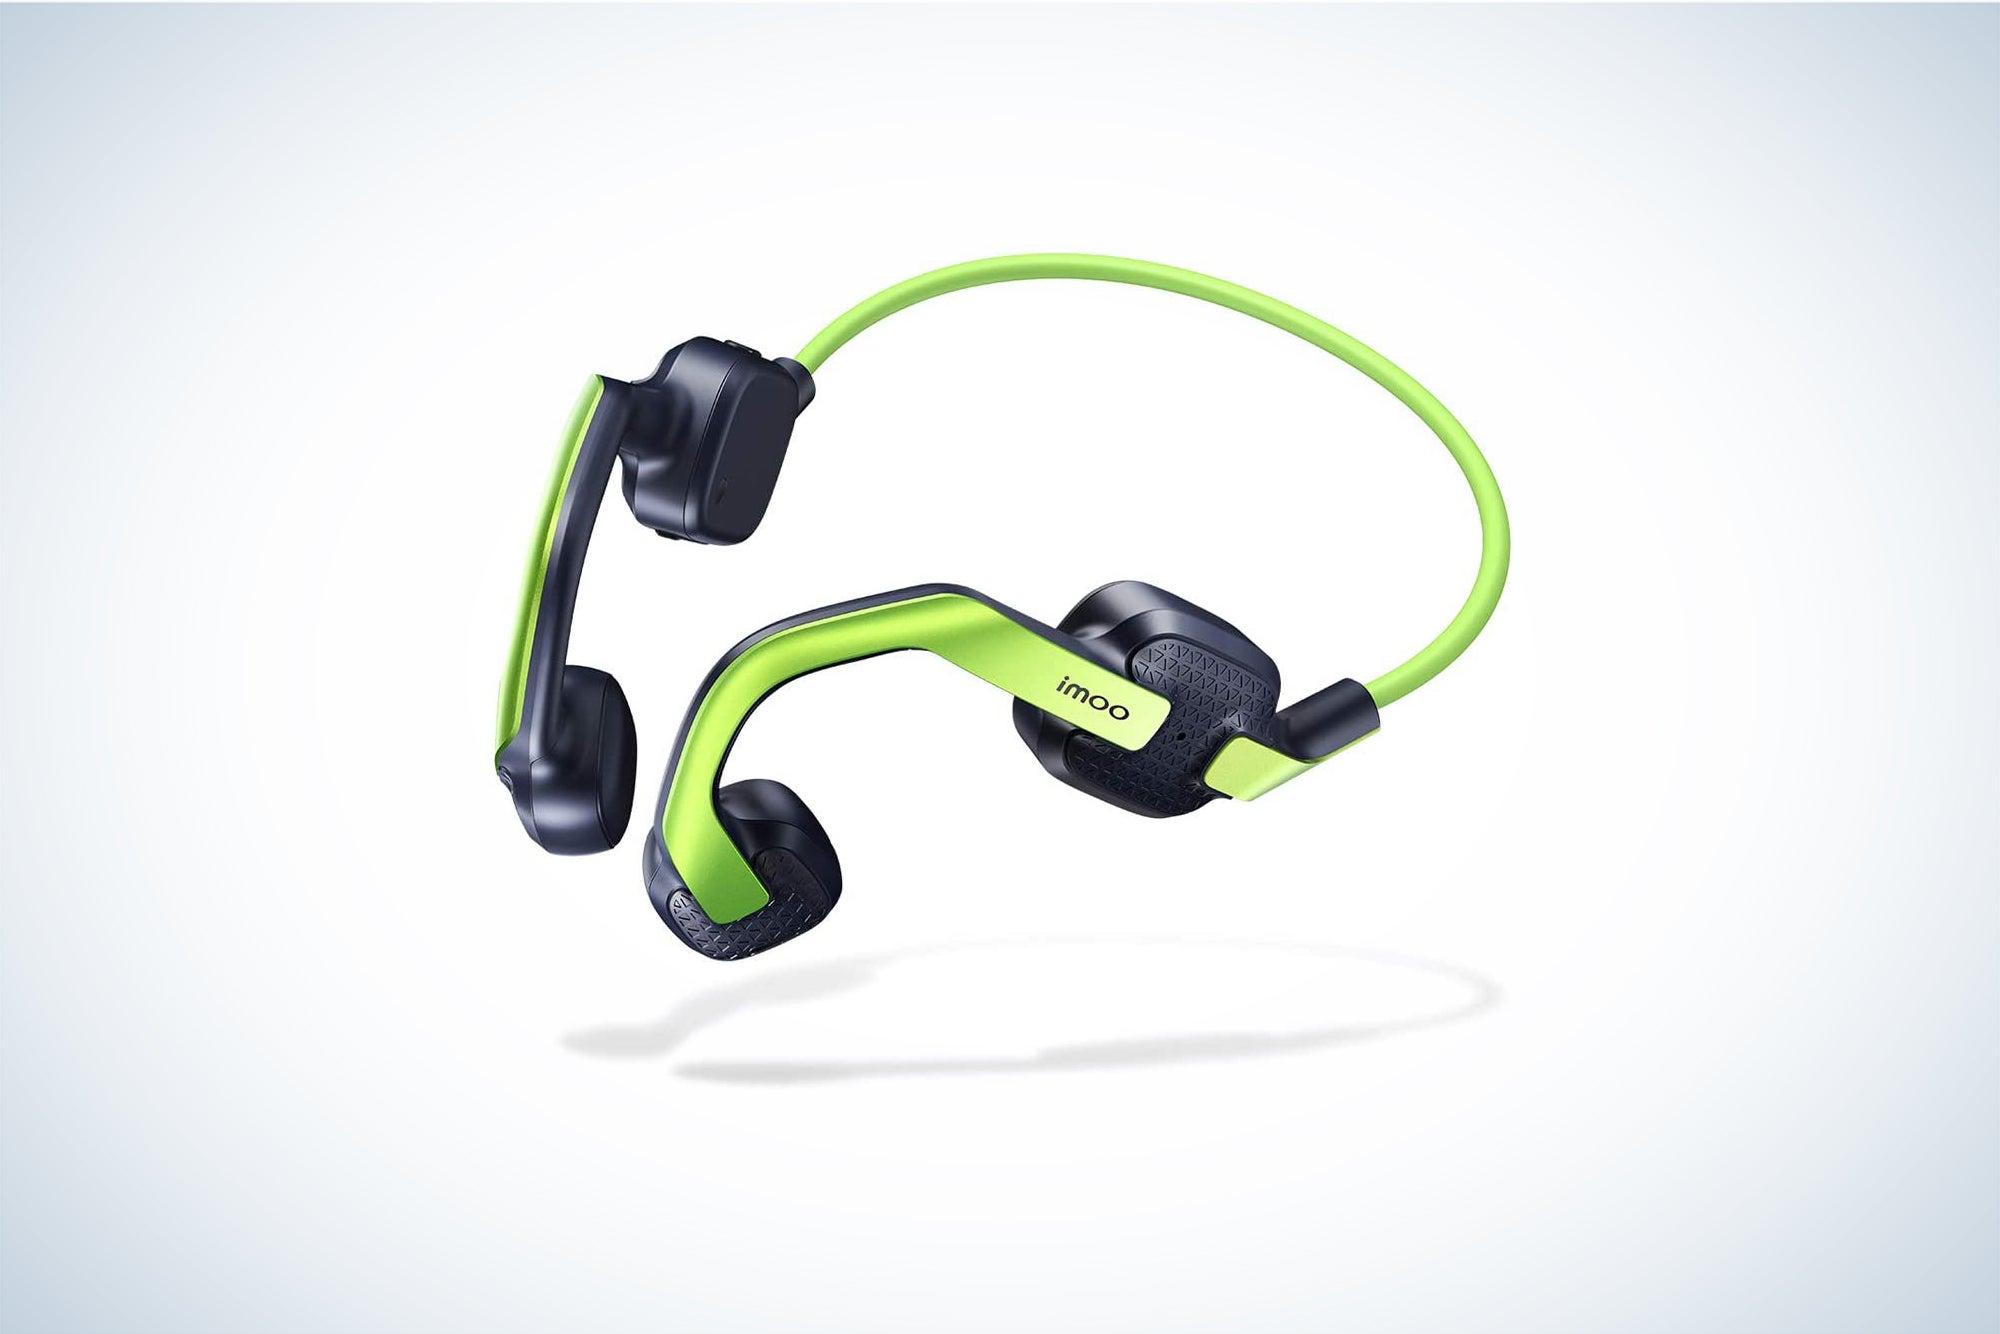 imoo kis are the best bone-conduction headphones.